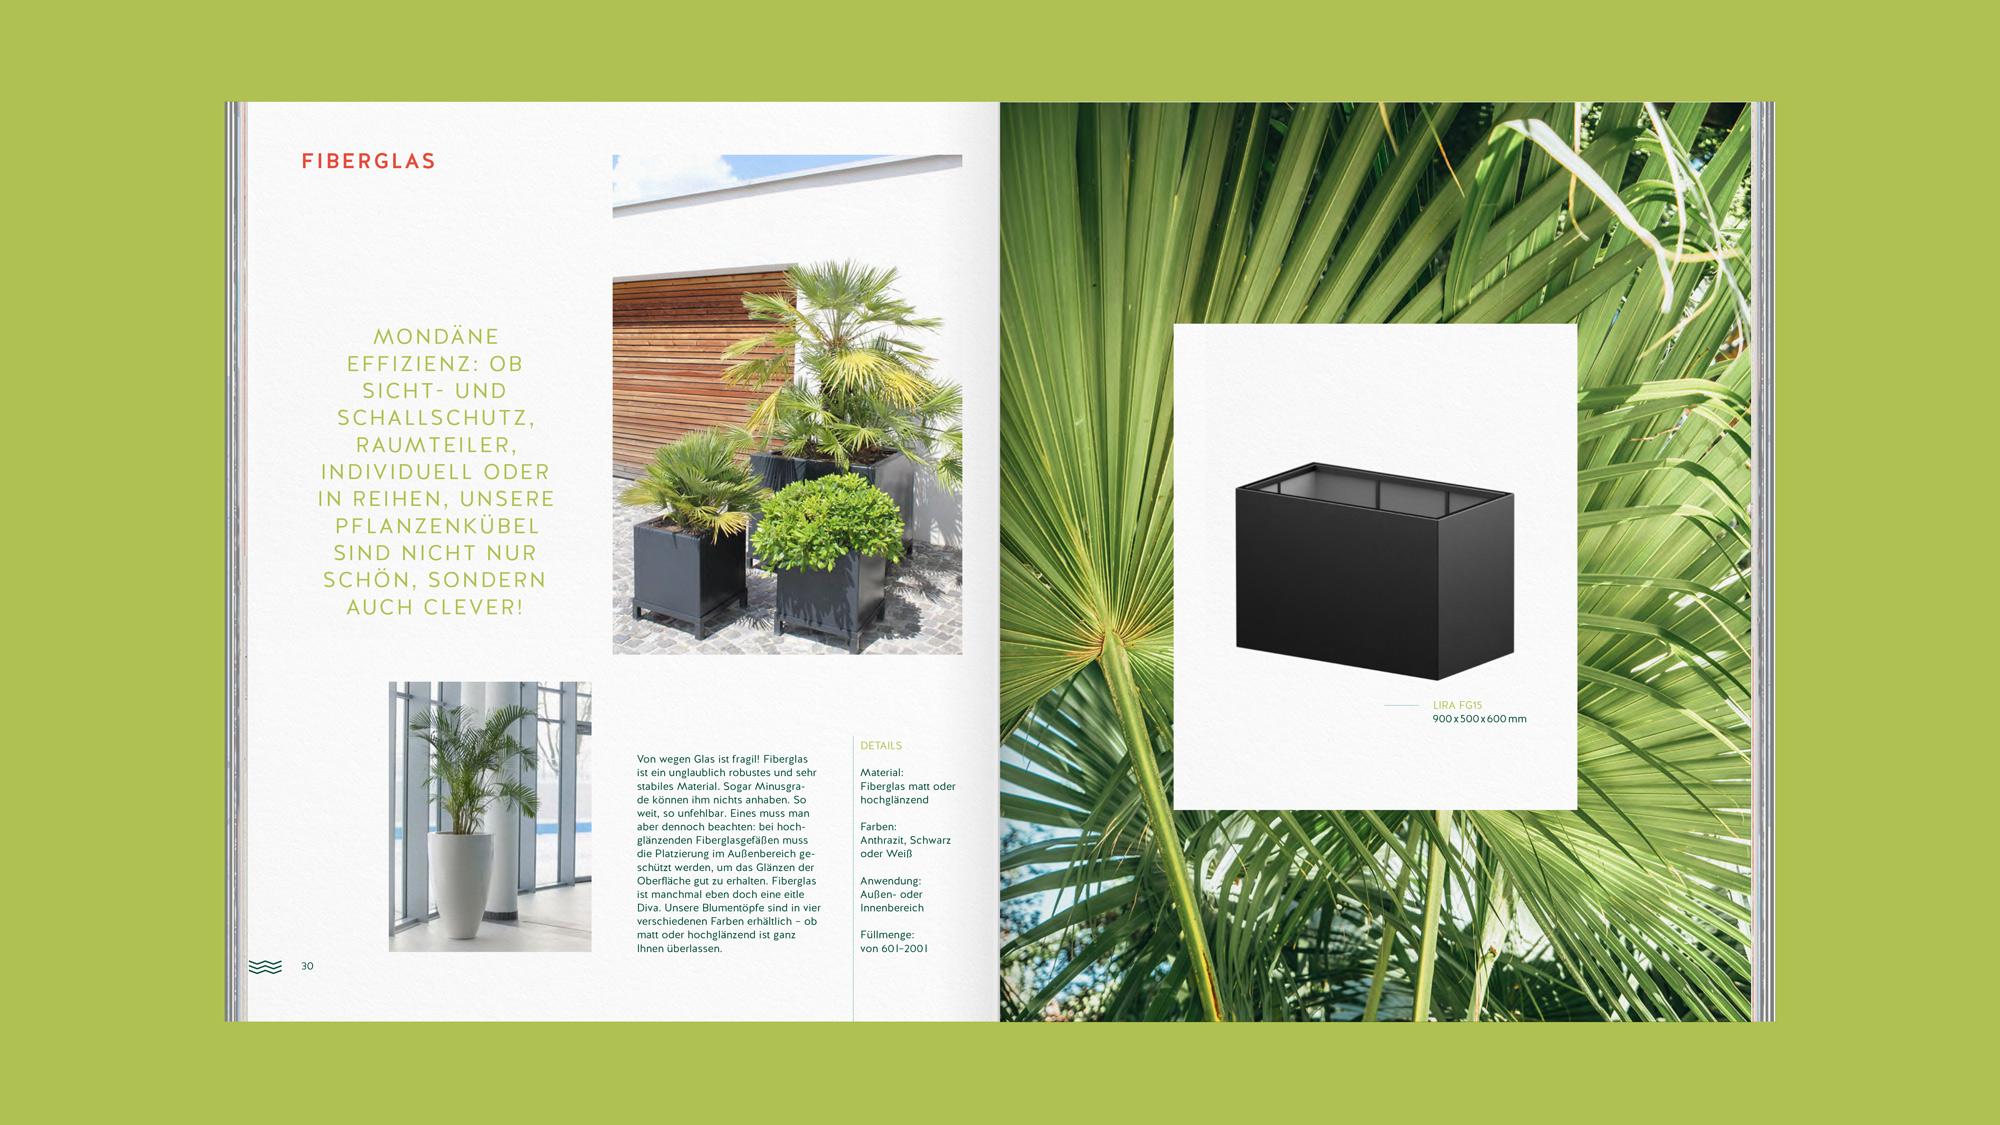 bluspa_plants_catalogue_1_open_2